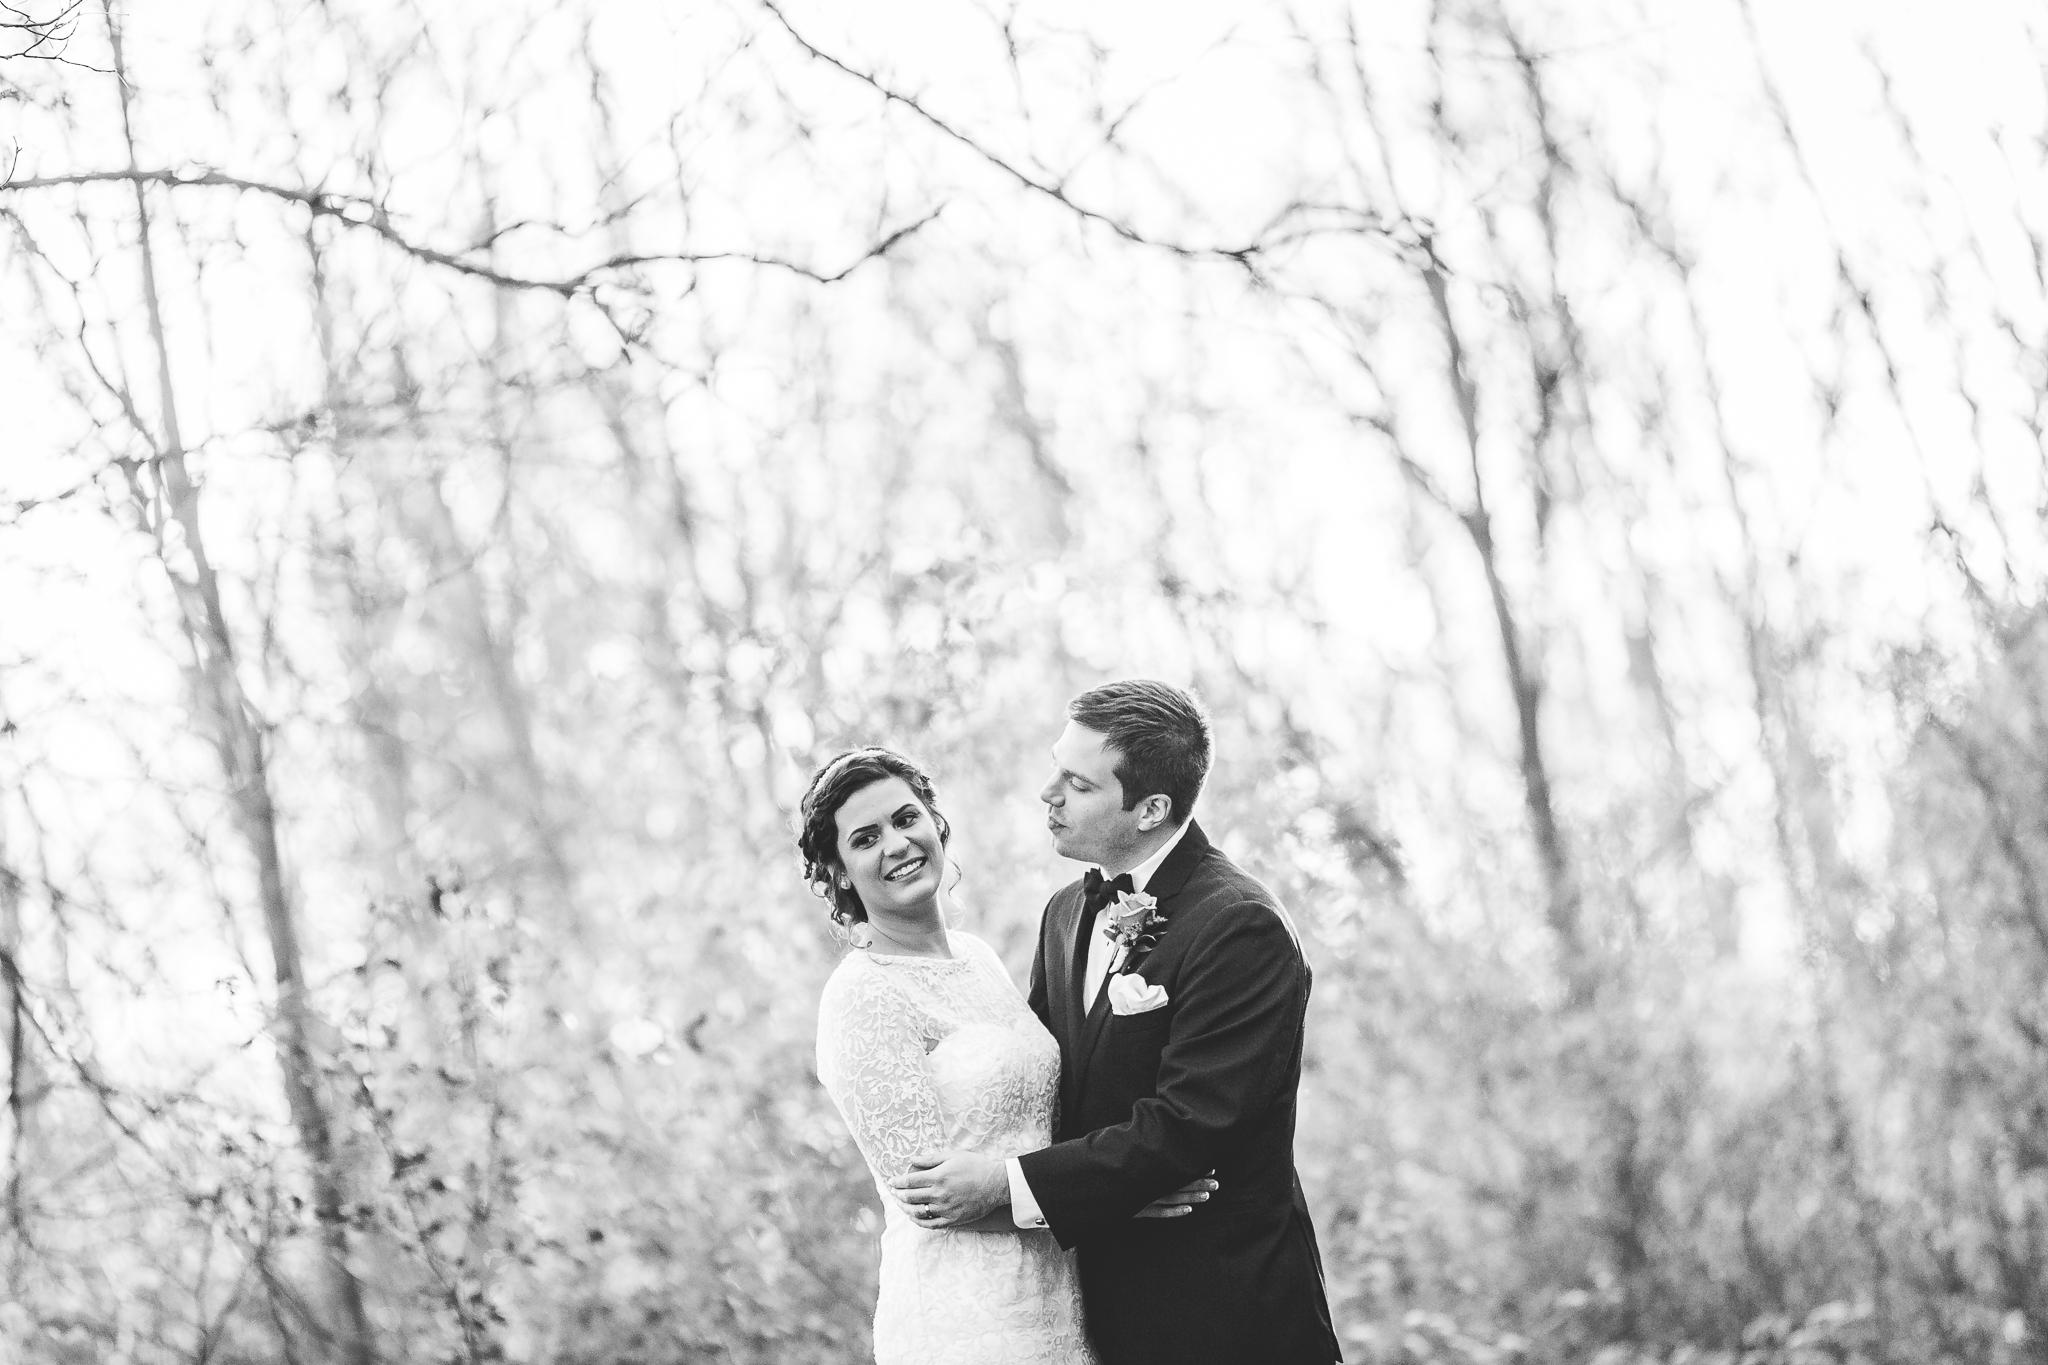 camuglia-whomstudio-chelsea_and_andy-nycphotographer-wedding-brooklyn-buffalo-timberlodge-054-5415.jpg